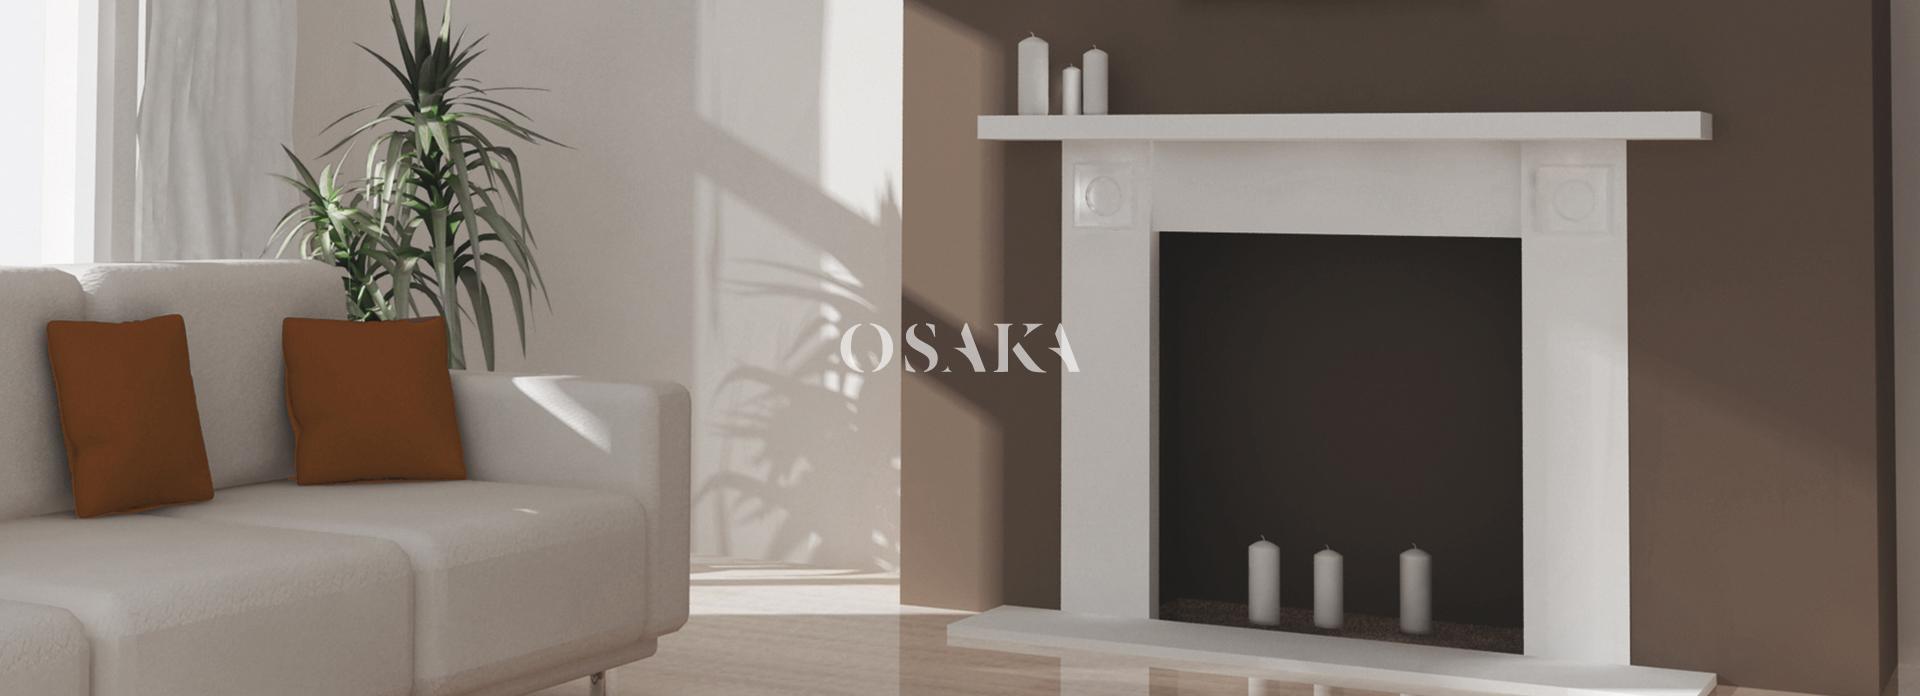 pintura-decorativa-sublime-1